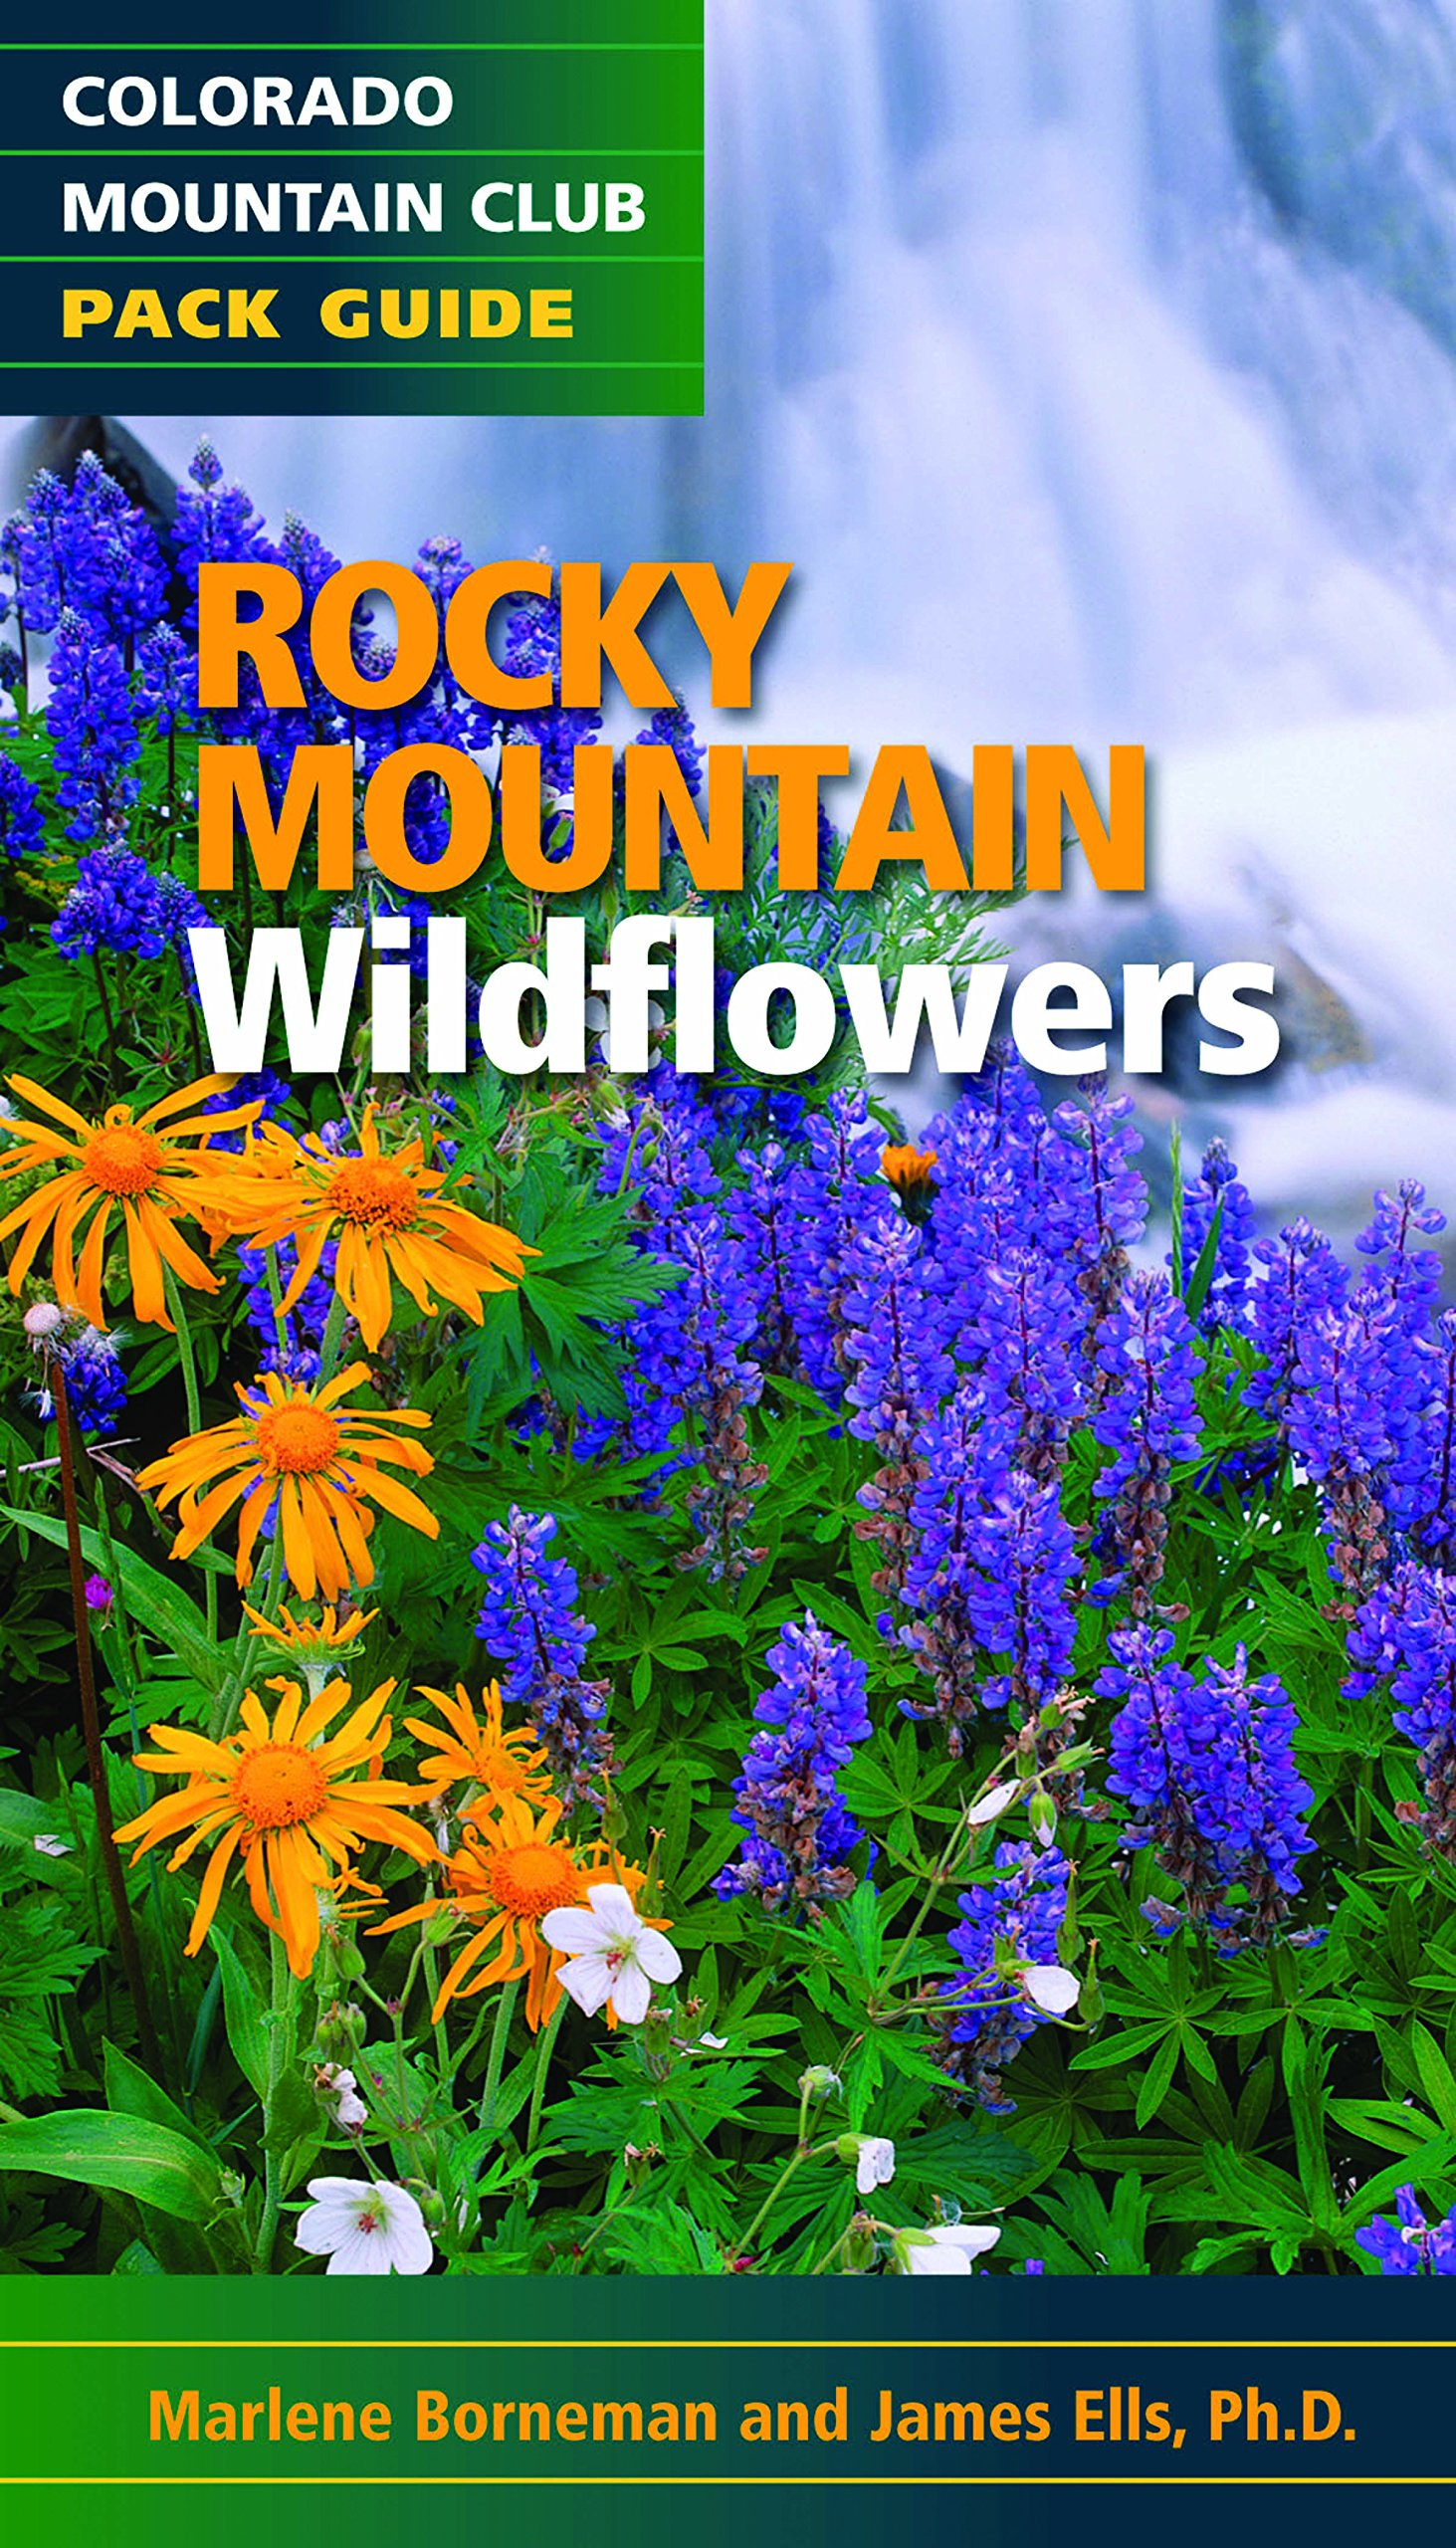 Rocky Mountain Wildflowers Colorado Mountain Club Pack Guide: Amazon.es: Ells Ph. D., James, Borneman, Mariene: Libros en idiomas extranjeros